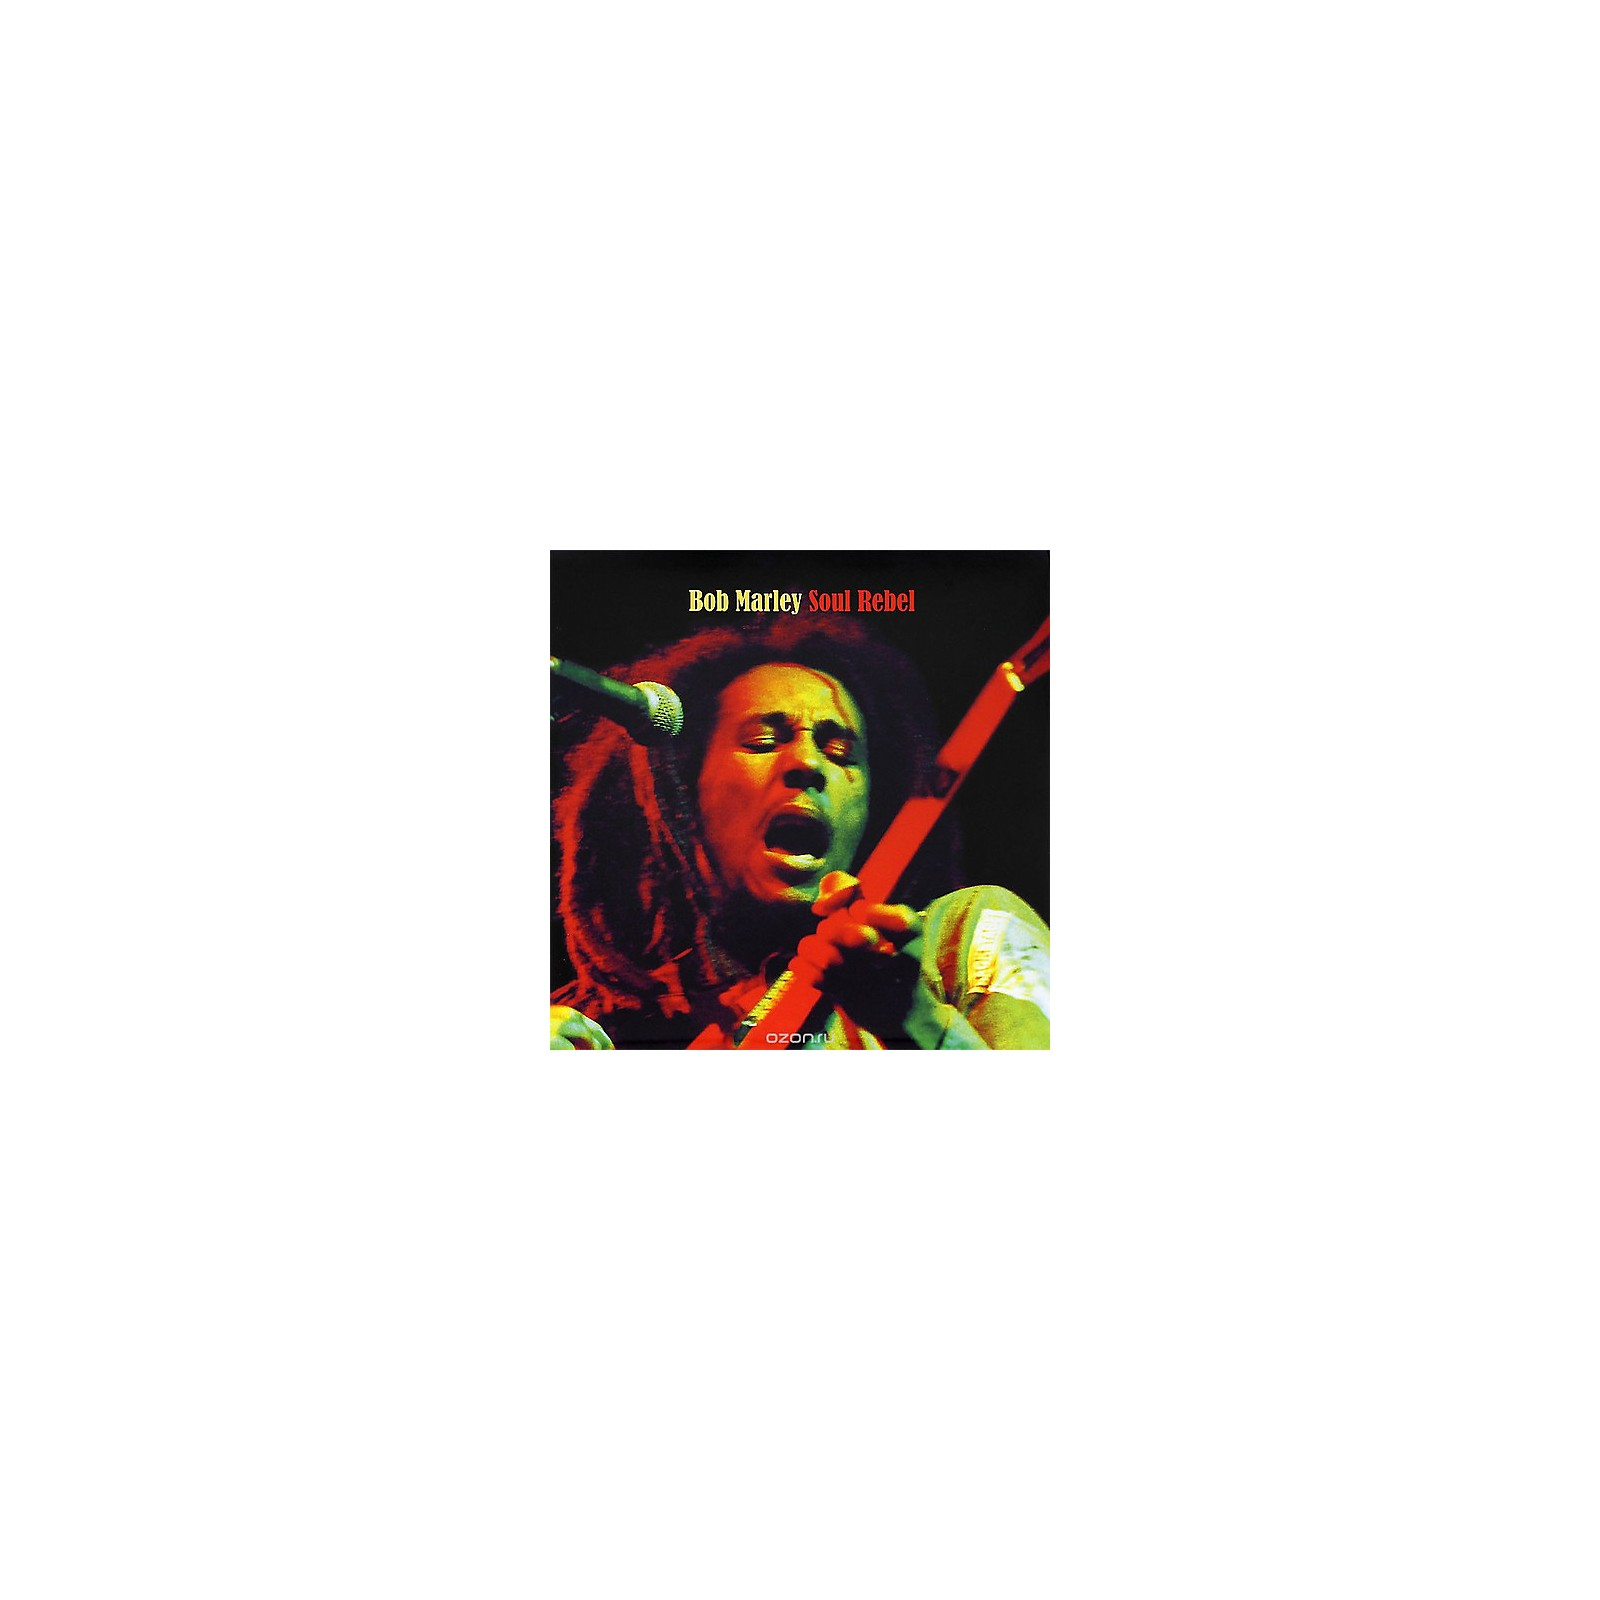 Alliance Bob Marley - Soul Rebel